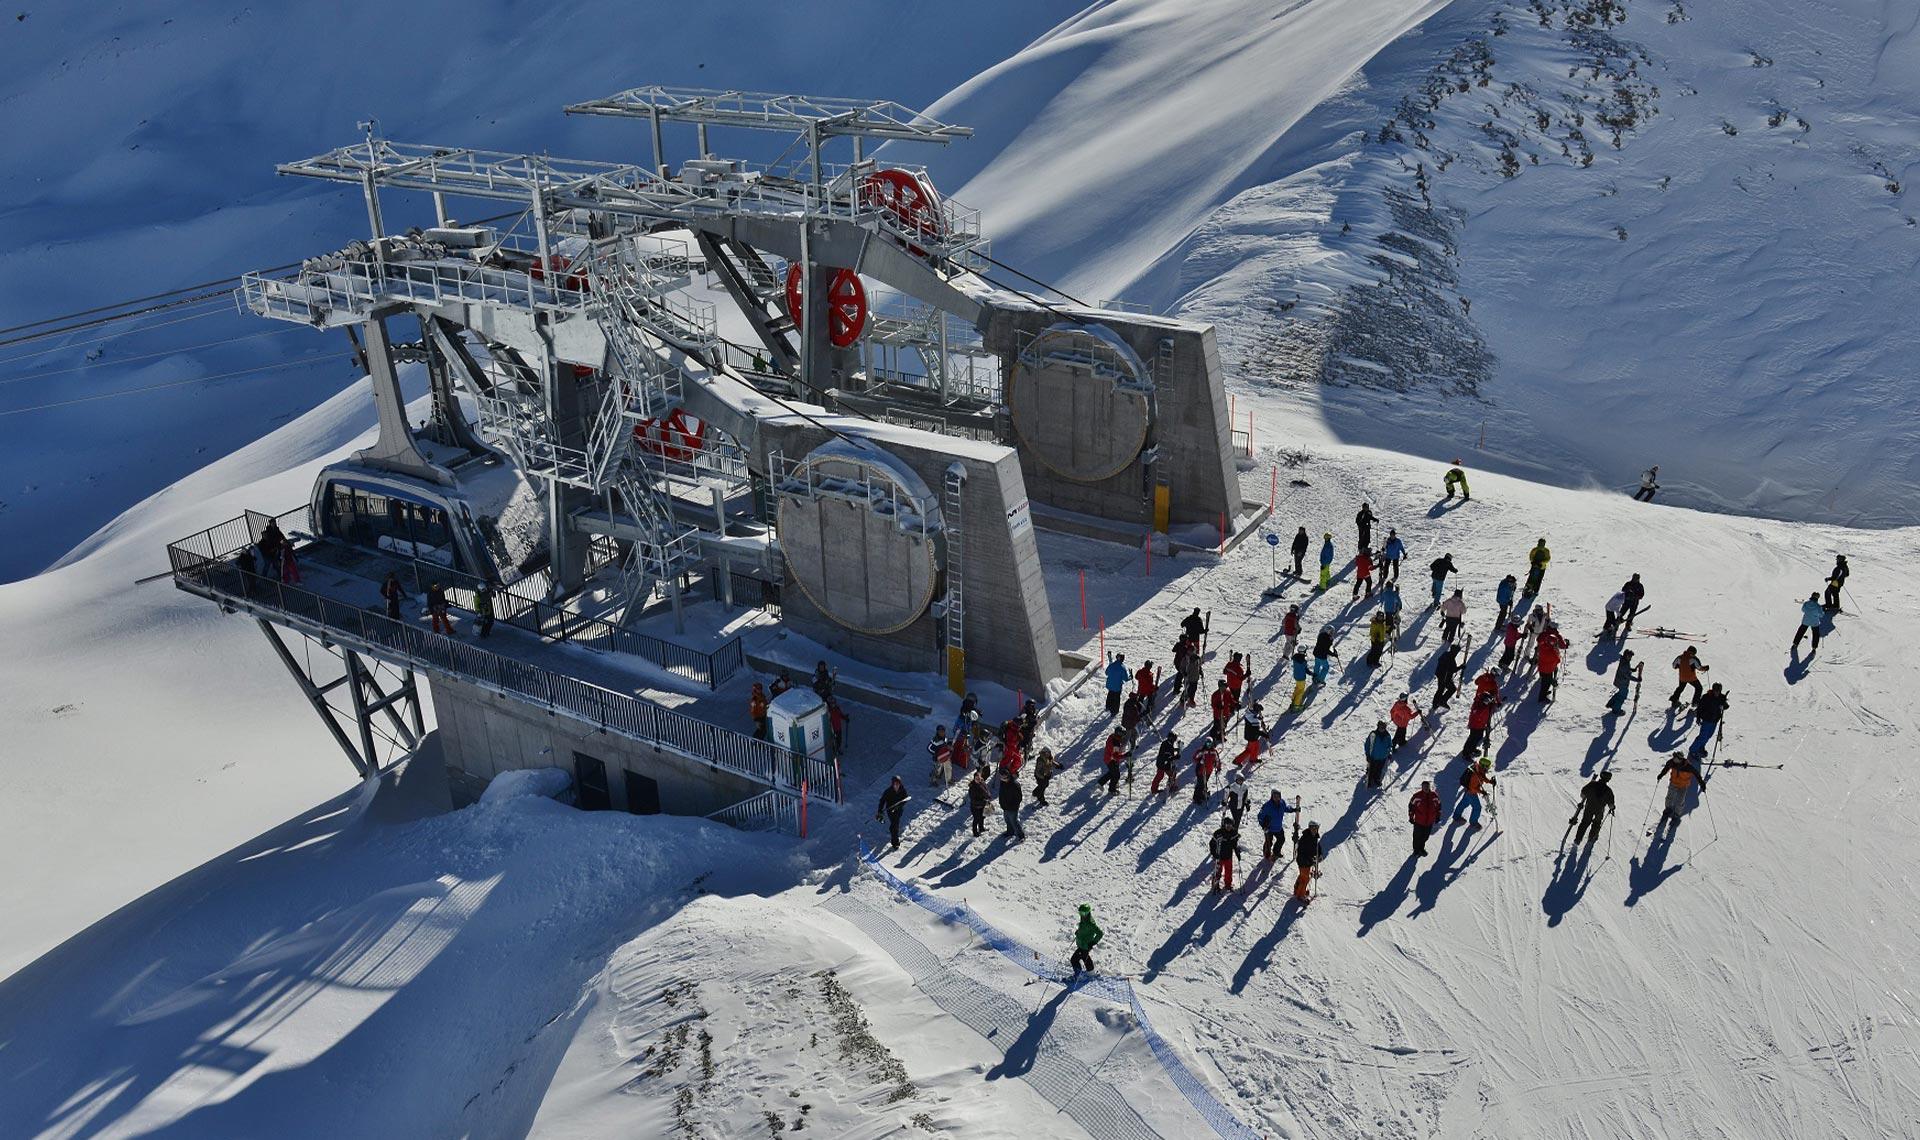 Arosa Bergbahnen, Arosa (CH)